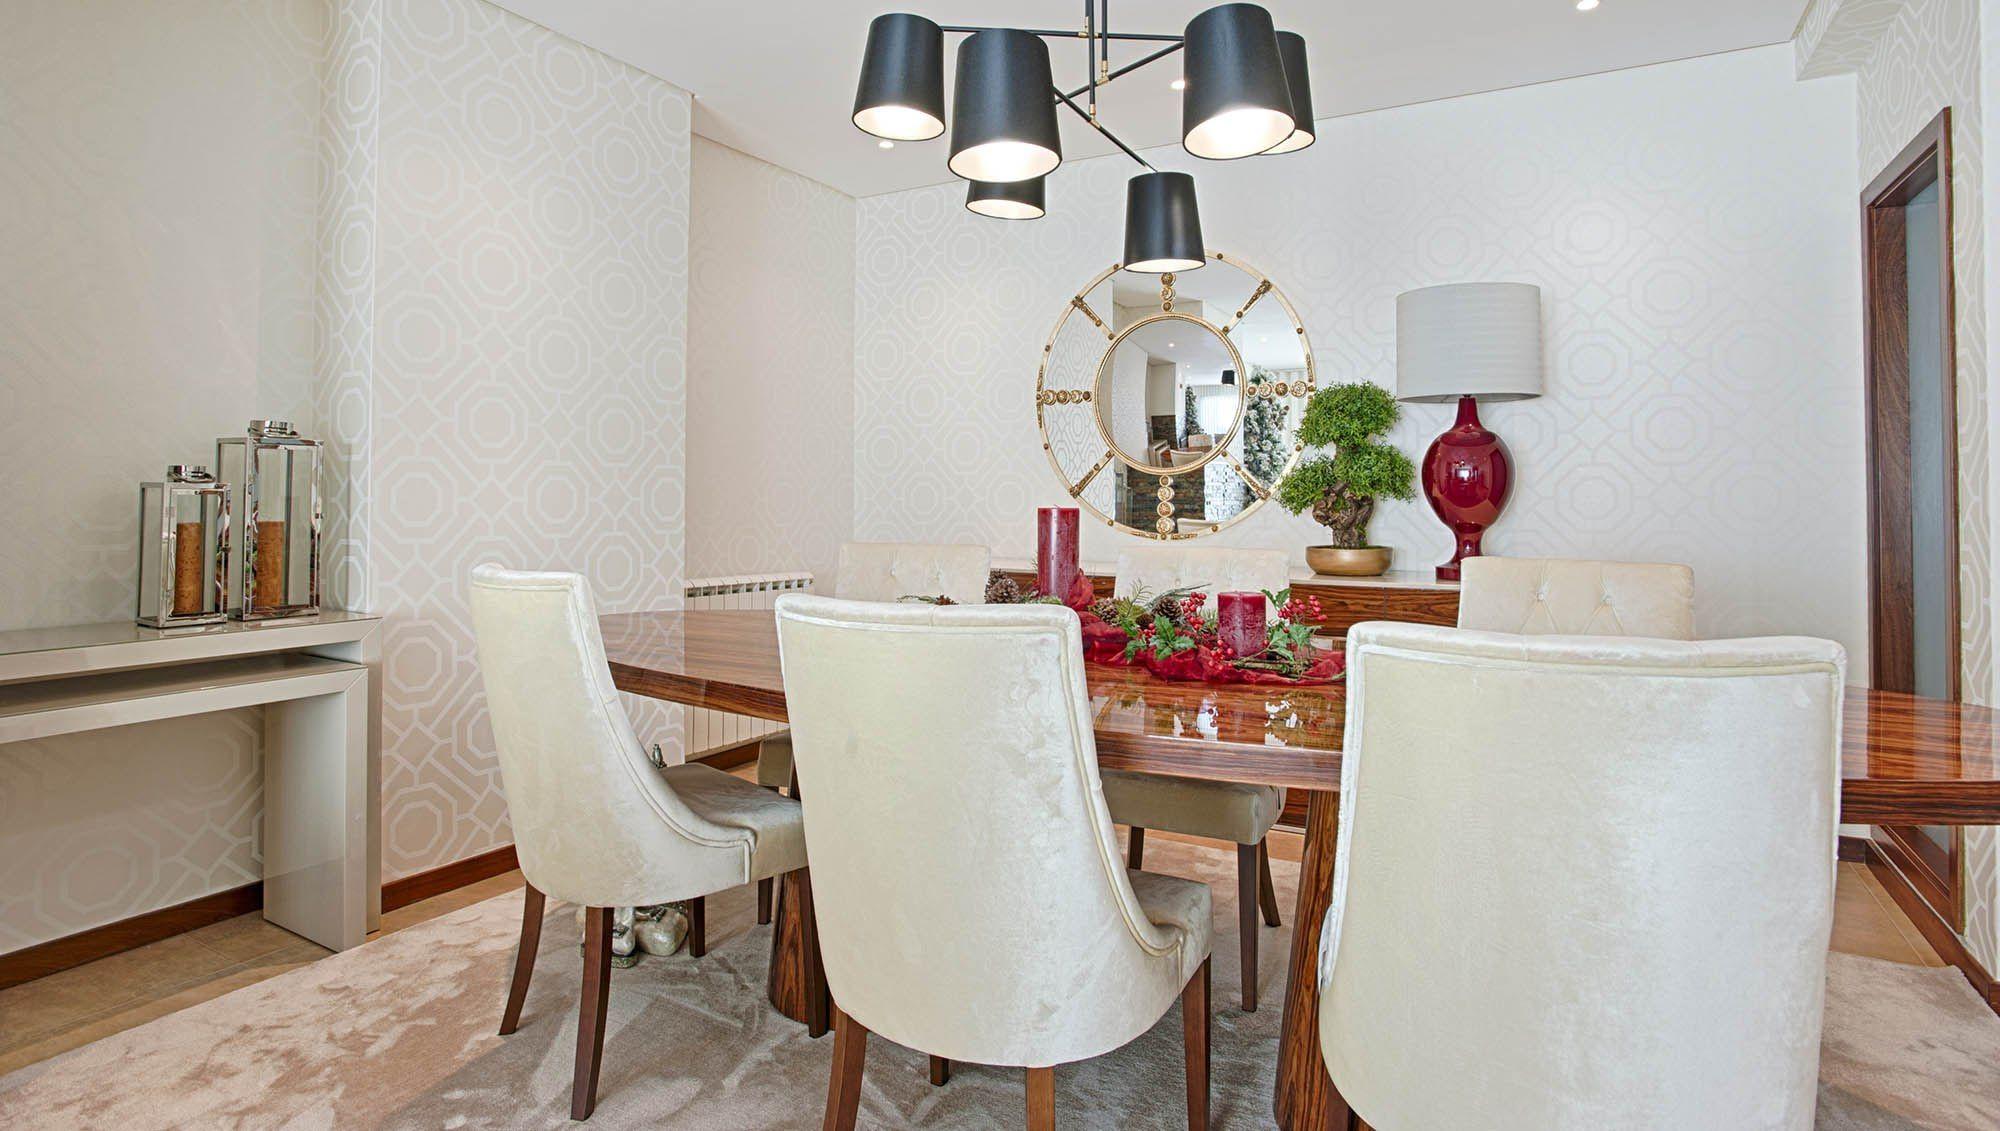 Laskasas | Decorate Life | Www.laskasas.com | Interio Design Project | Home